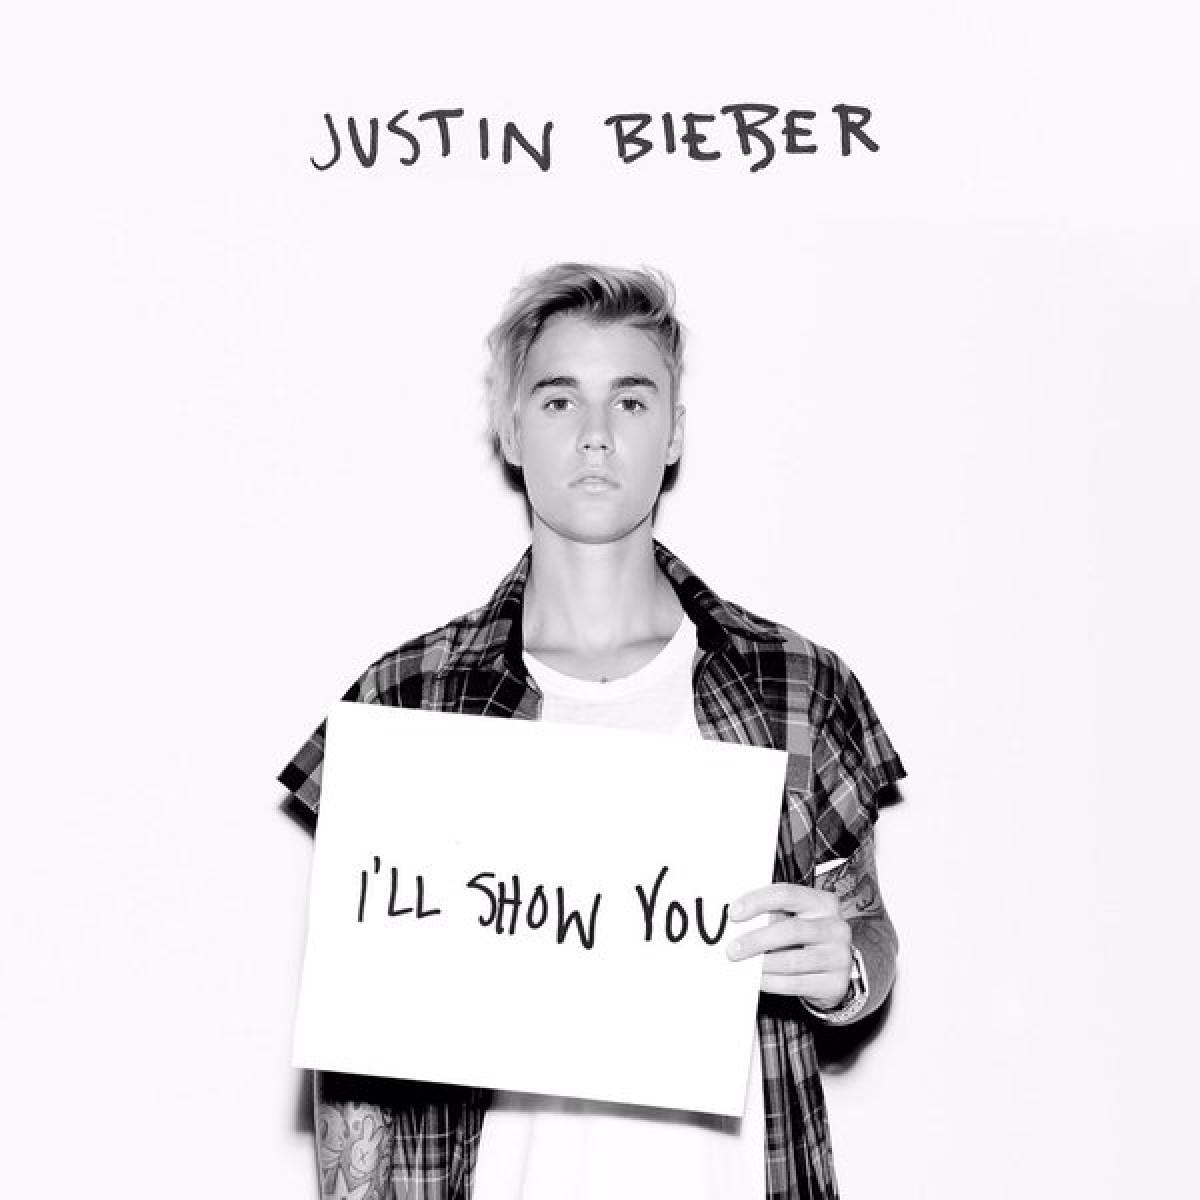 'I'll Show You', nuevo single de Justin Bieber (video)